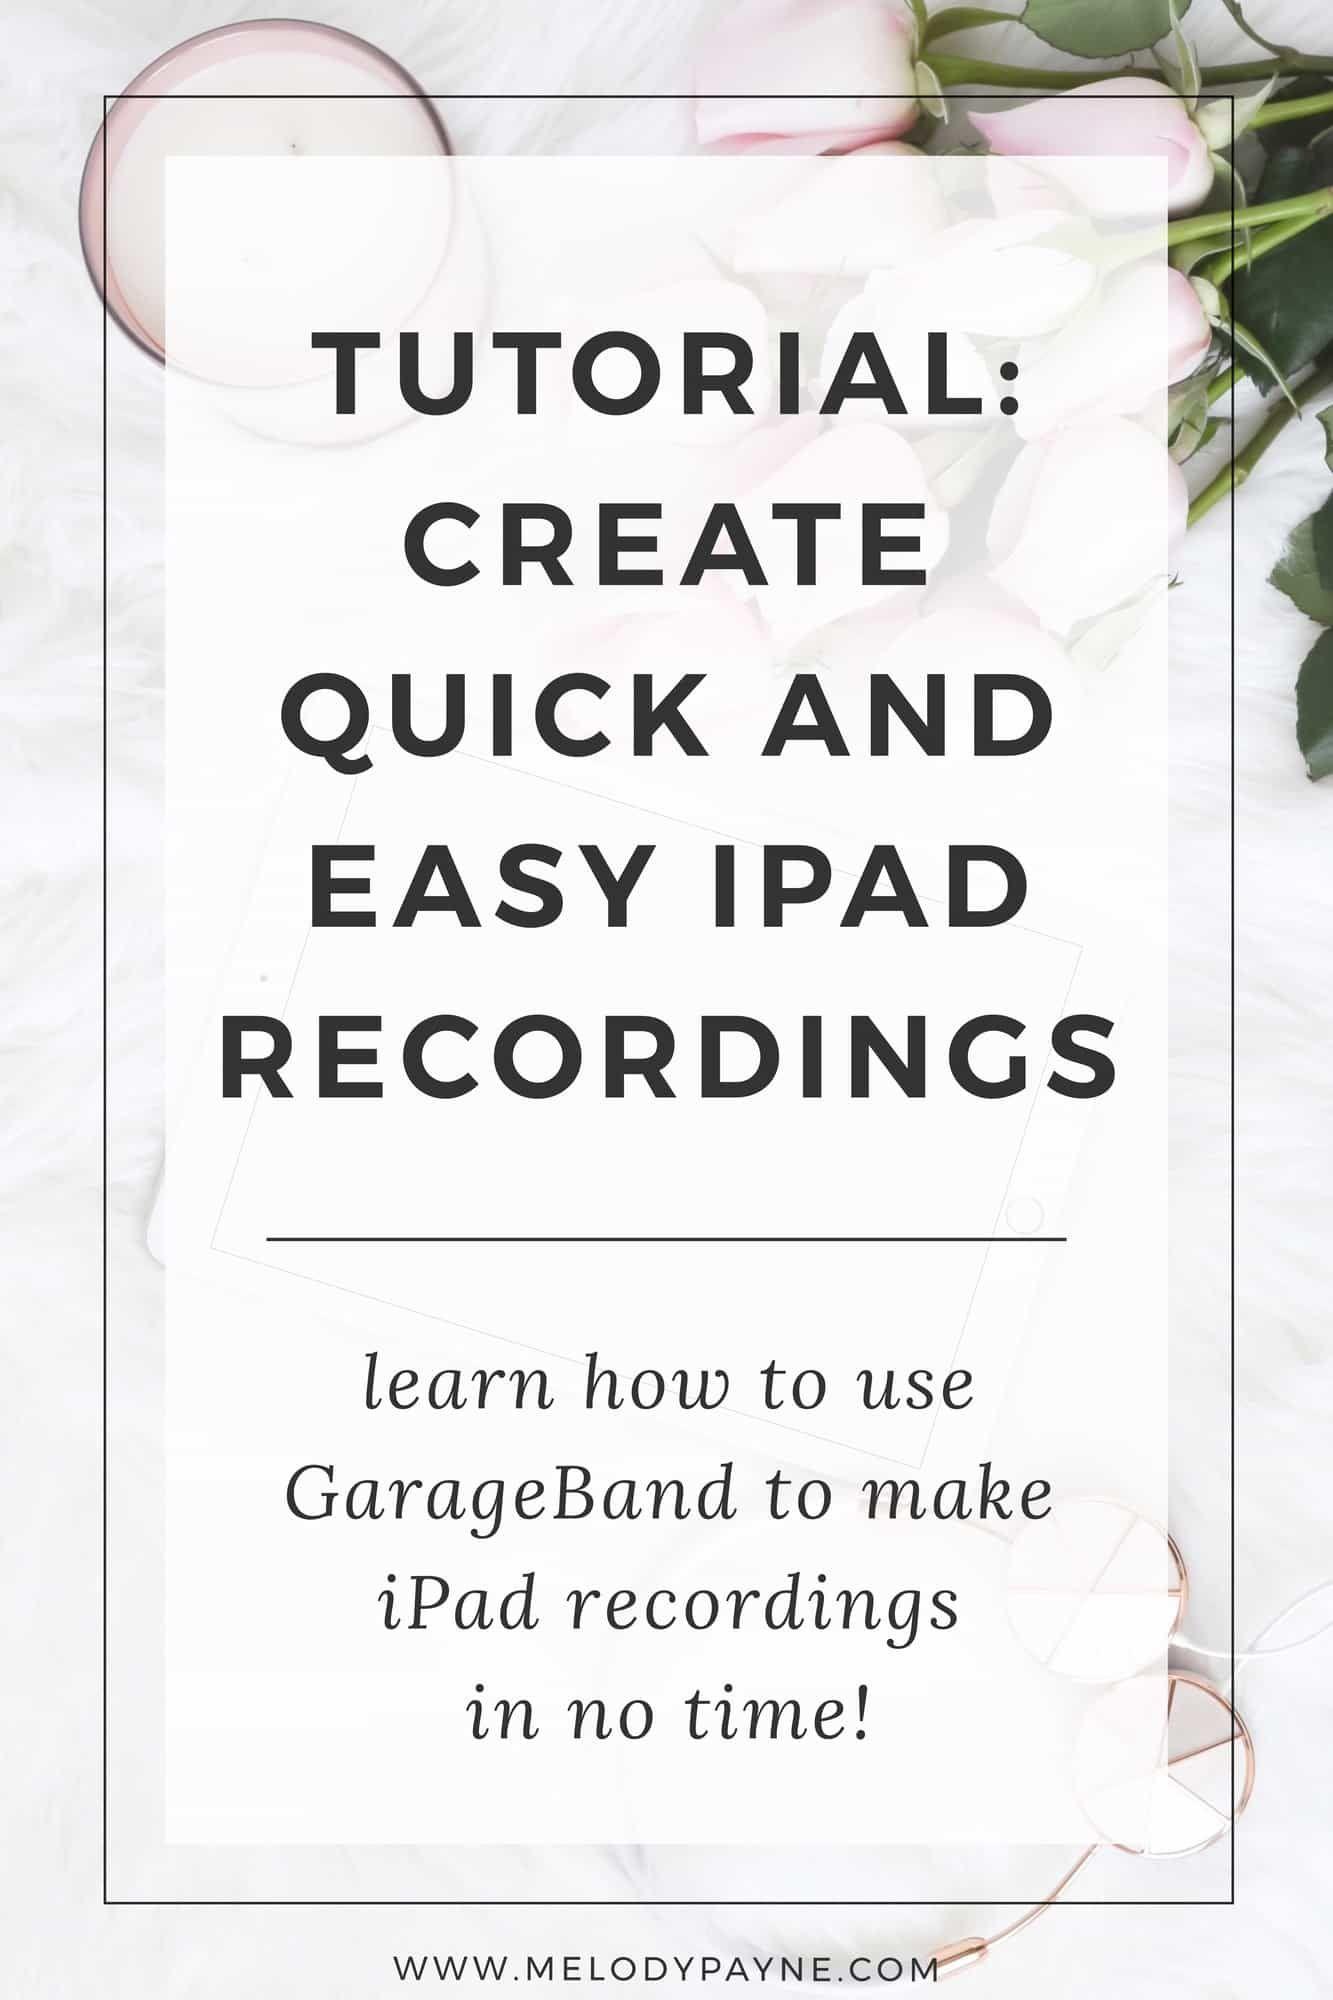 Garageband 101 how to create quick easy recordings on